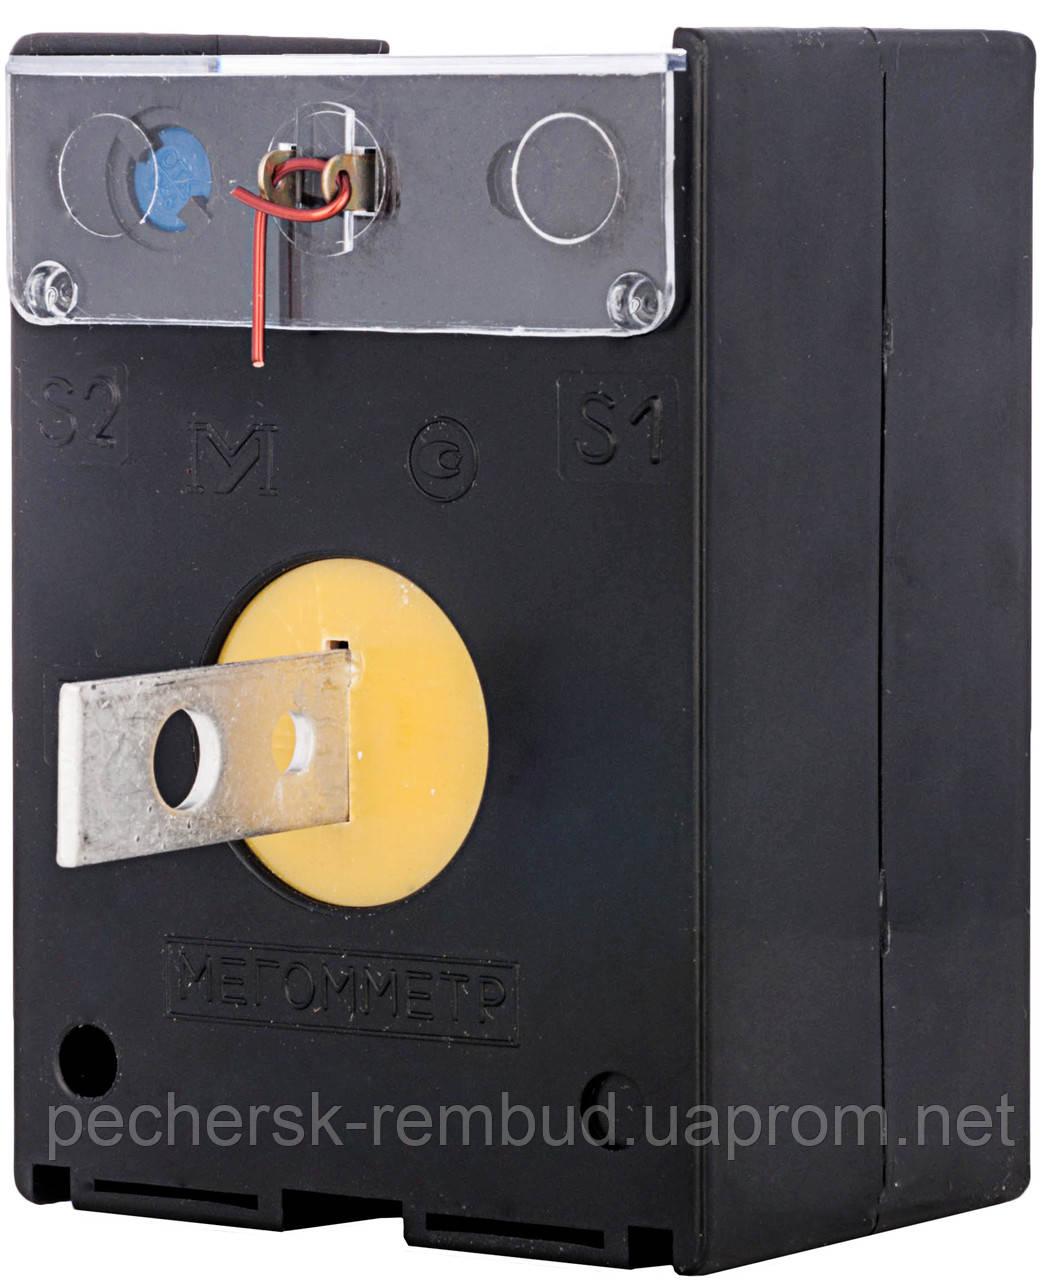 Трансформатор тока Т 0,66А 300/5 05s 16 лет поверка